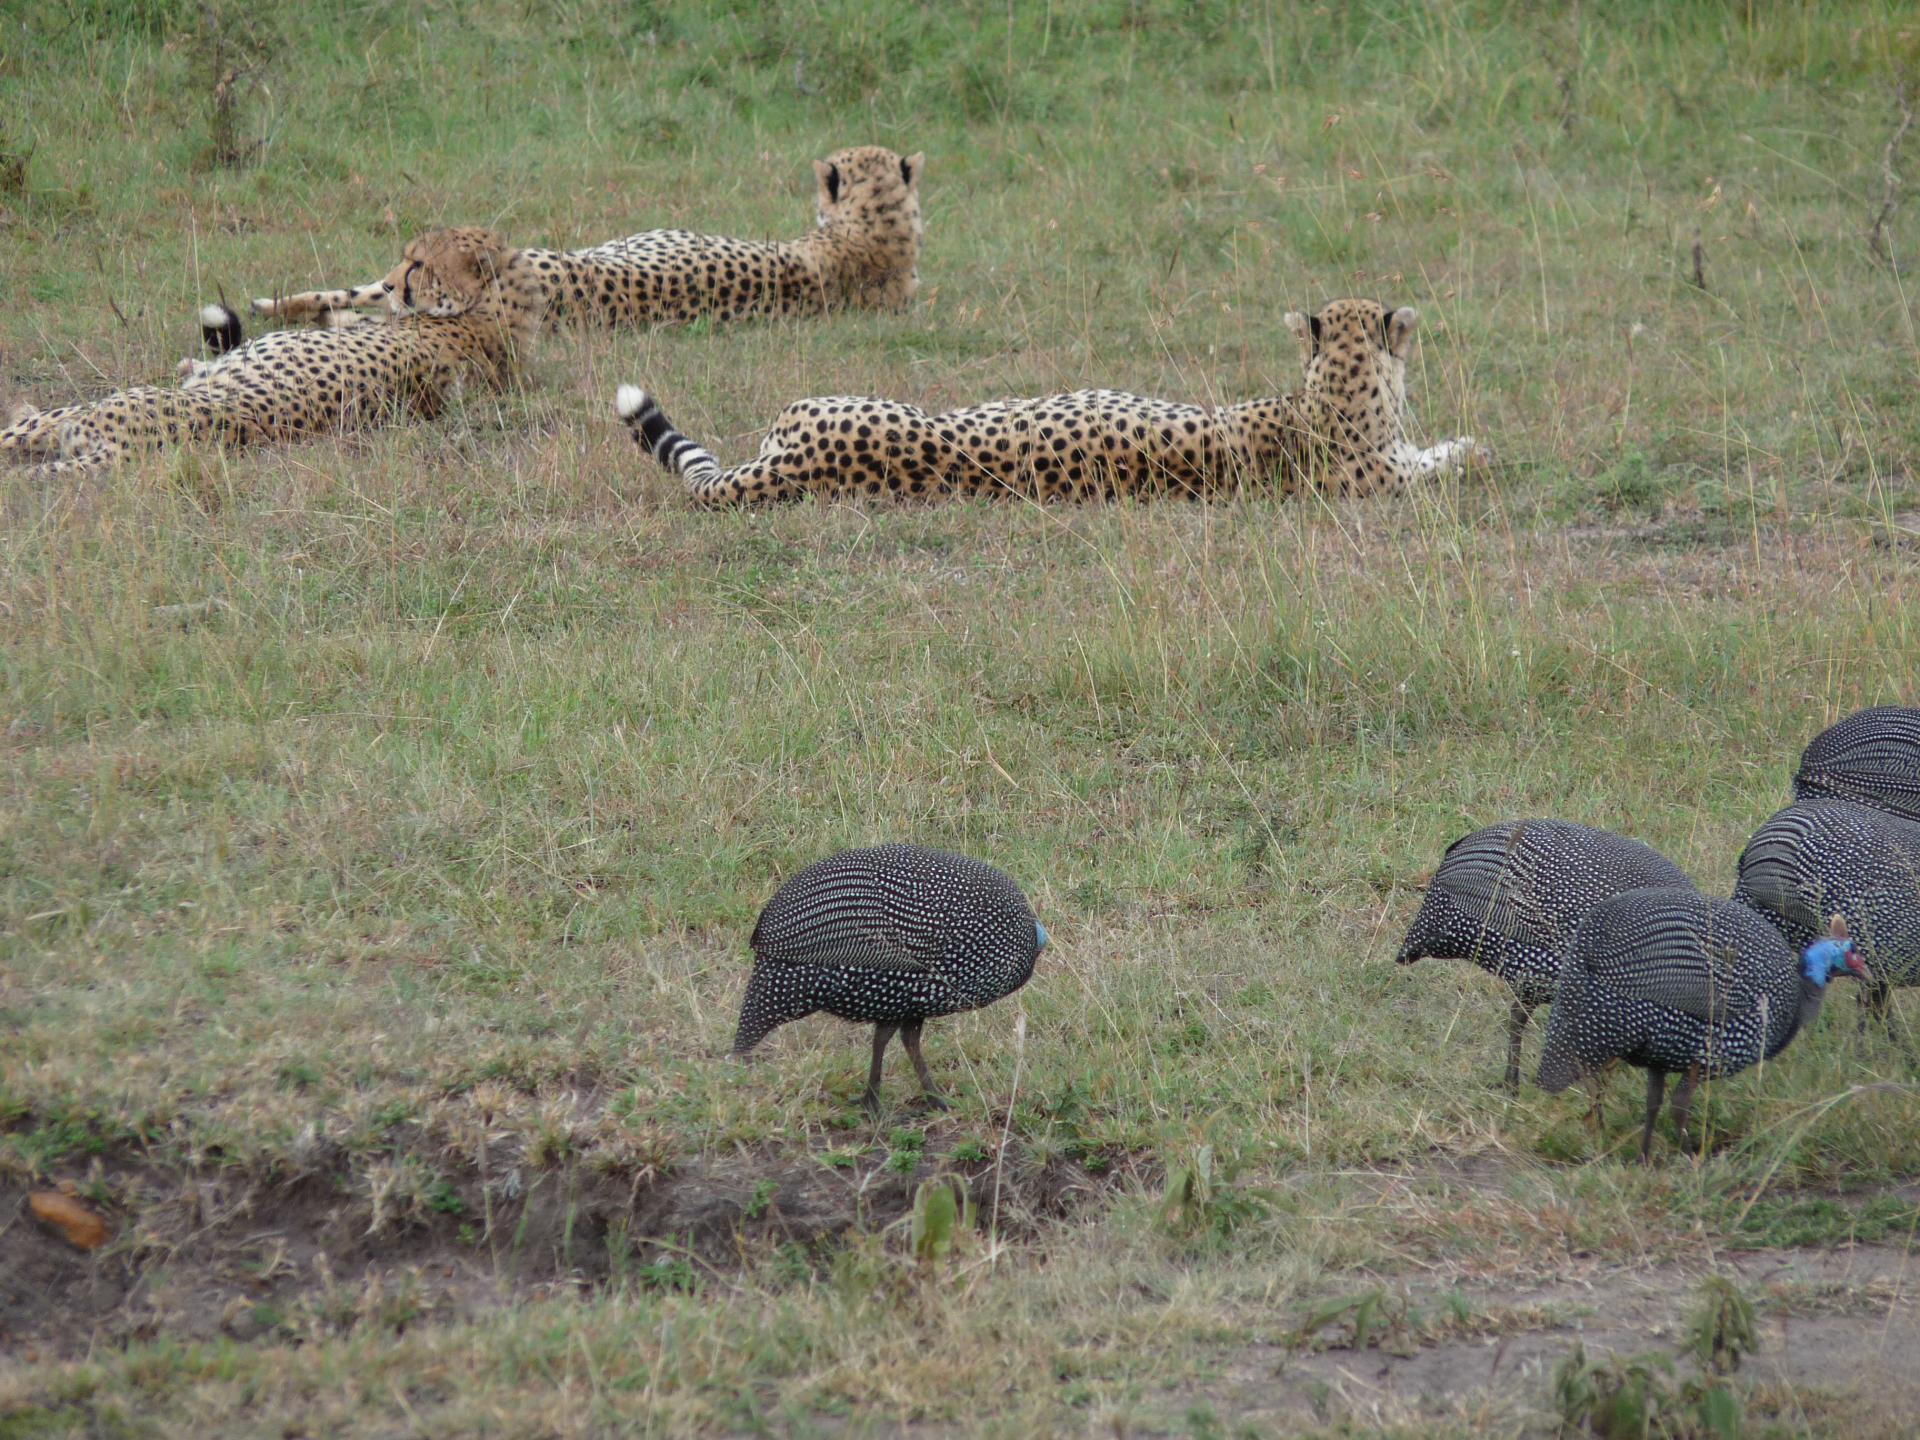 Kenya Adventure Safaris/yha kenya travel/ Cheetah